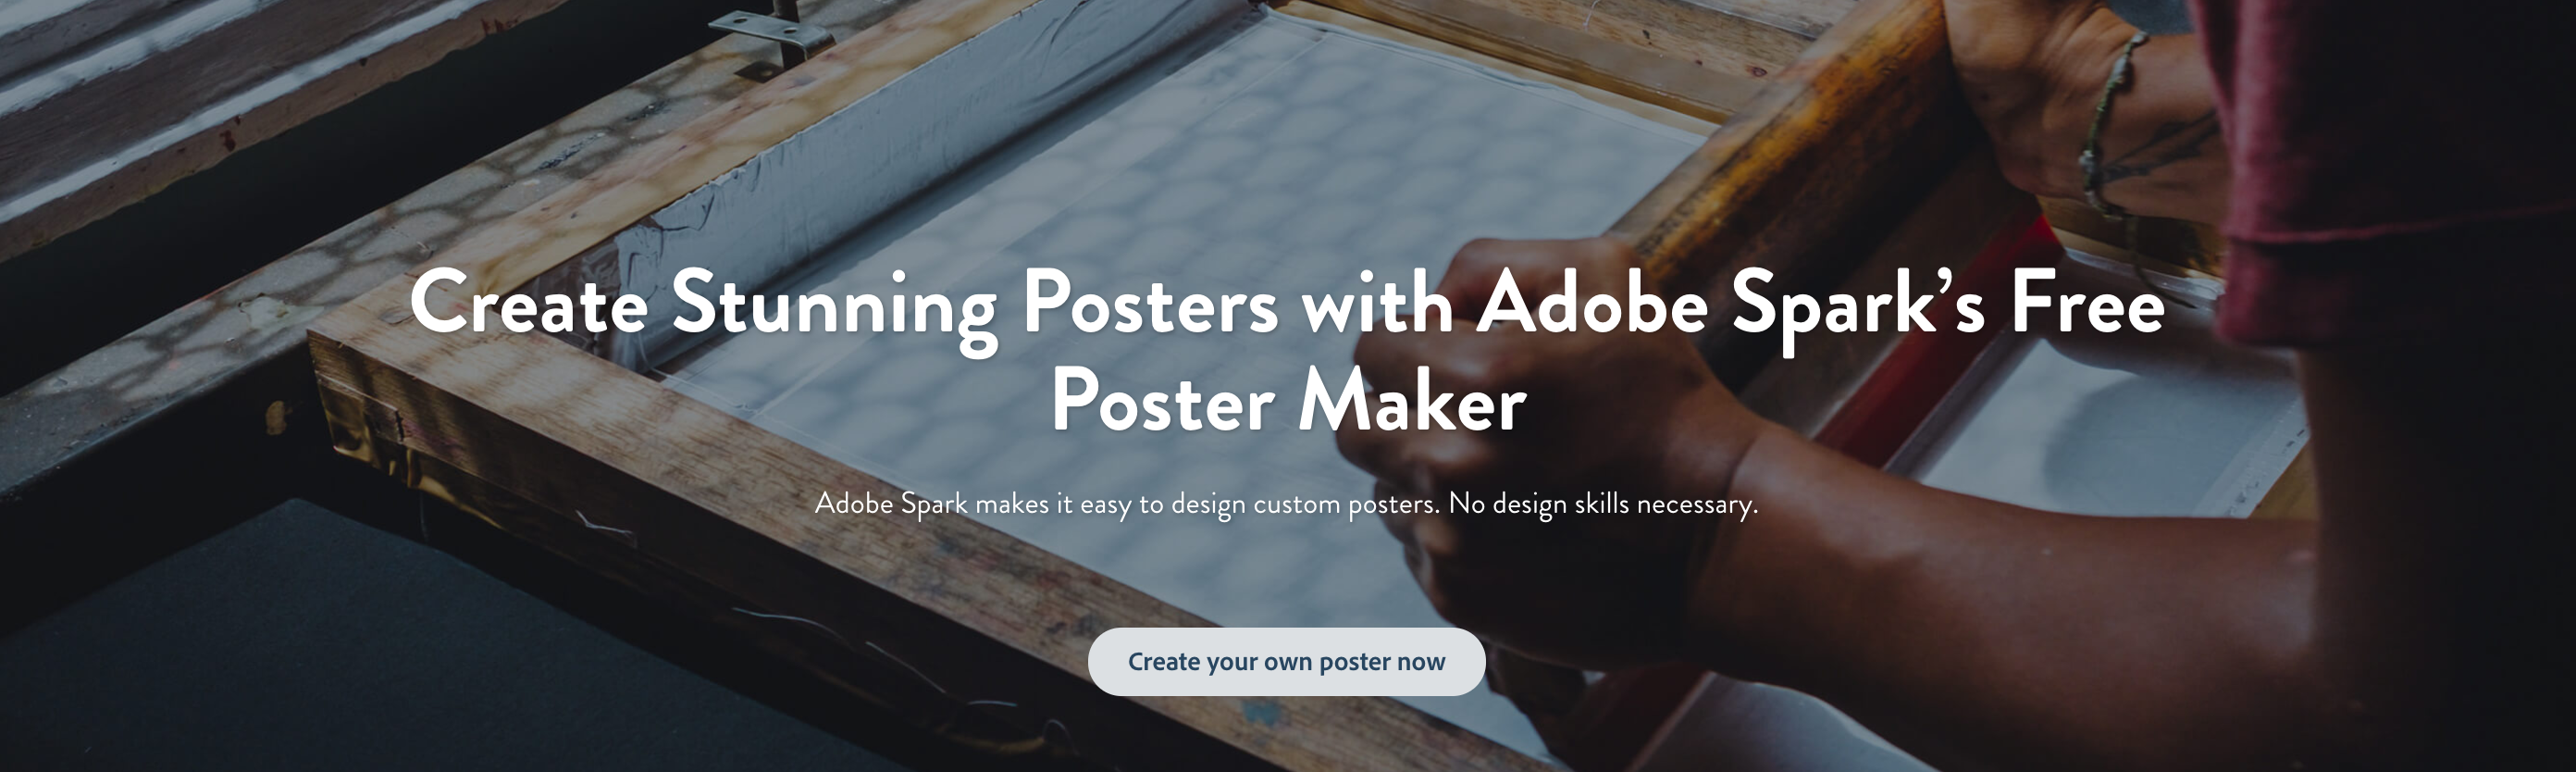 adobe spark u2019s free online poster maker helps you create